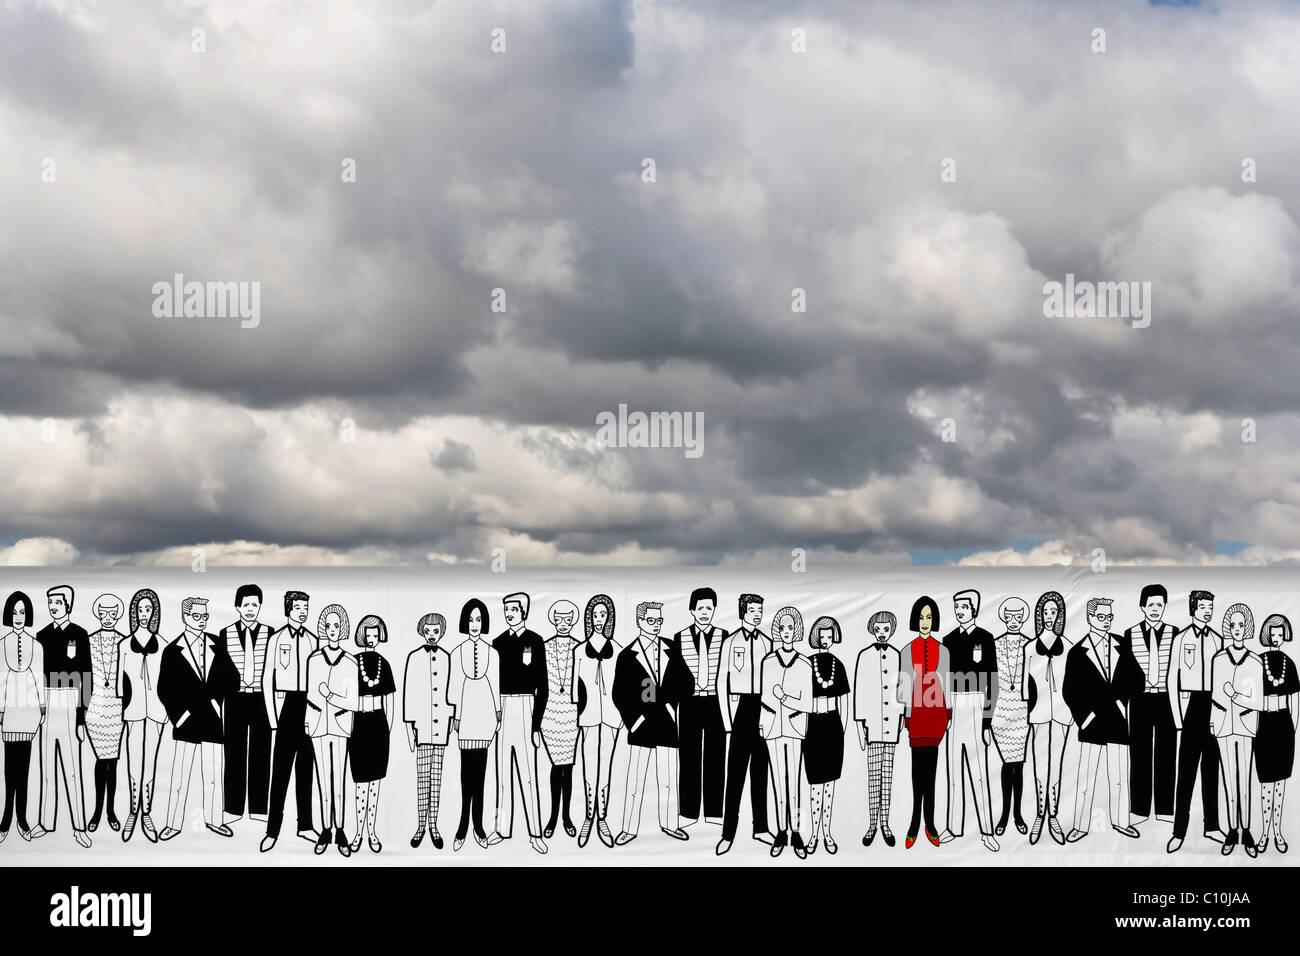 Line Drawings Stockfotos & Line Drawings Bilder - Alamy